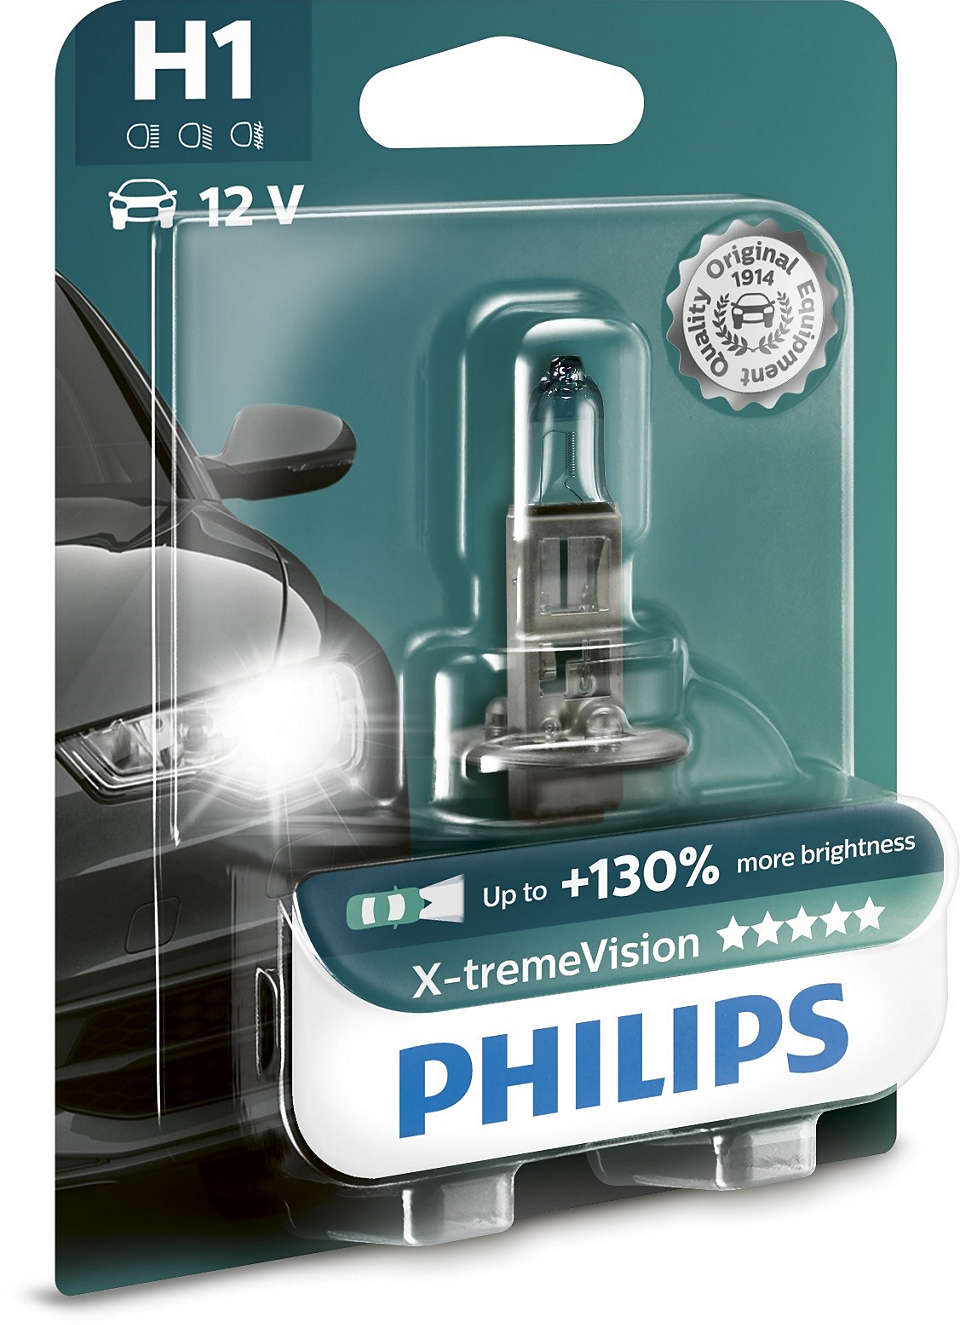 A/Лампа Philips H1 X-Tremevision Philips арт. 12258xv b1 фото